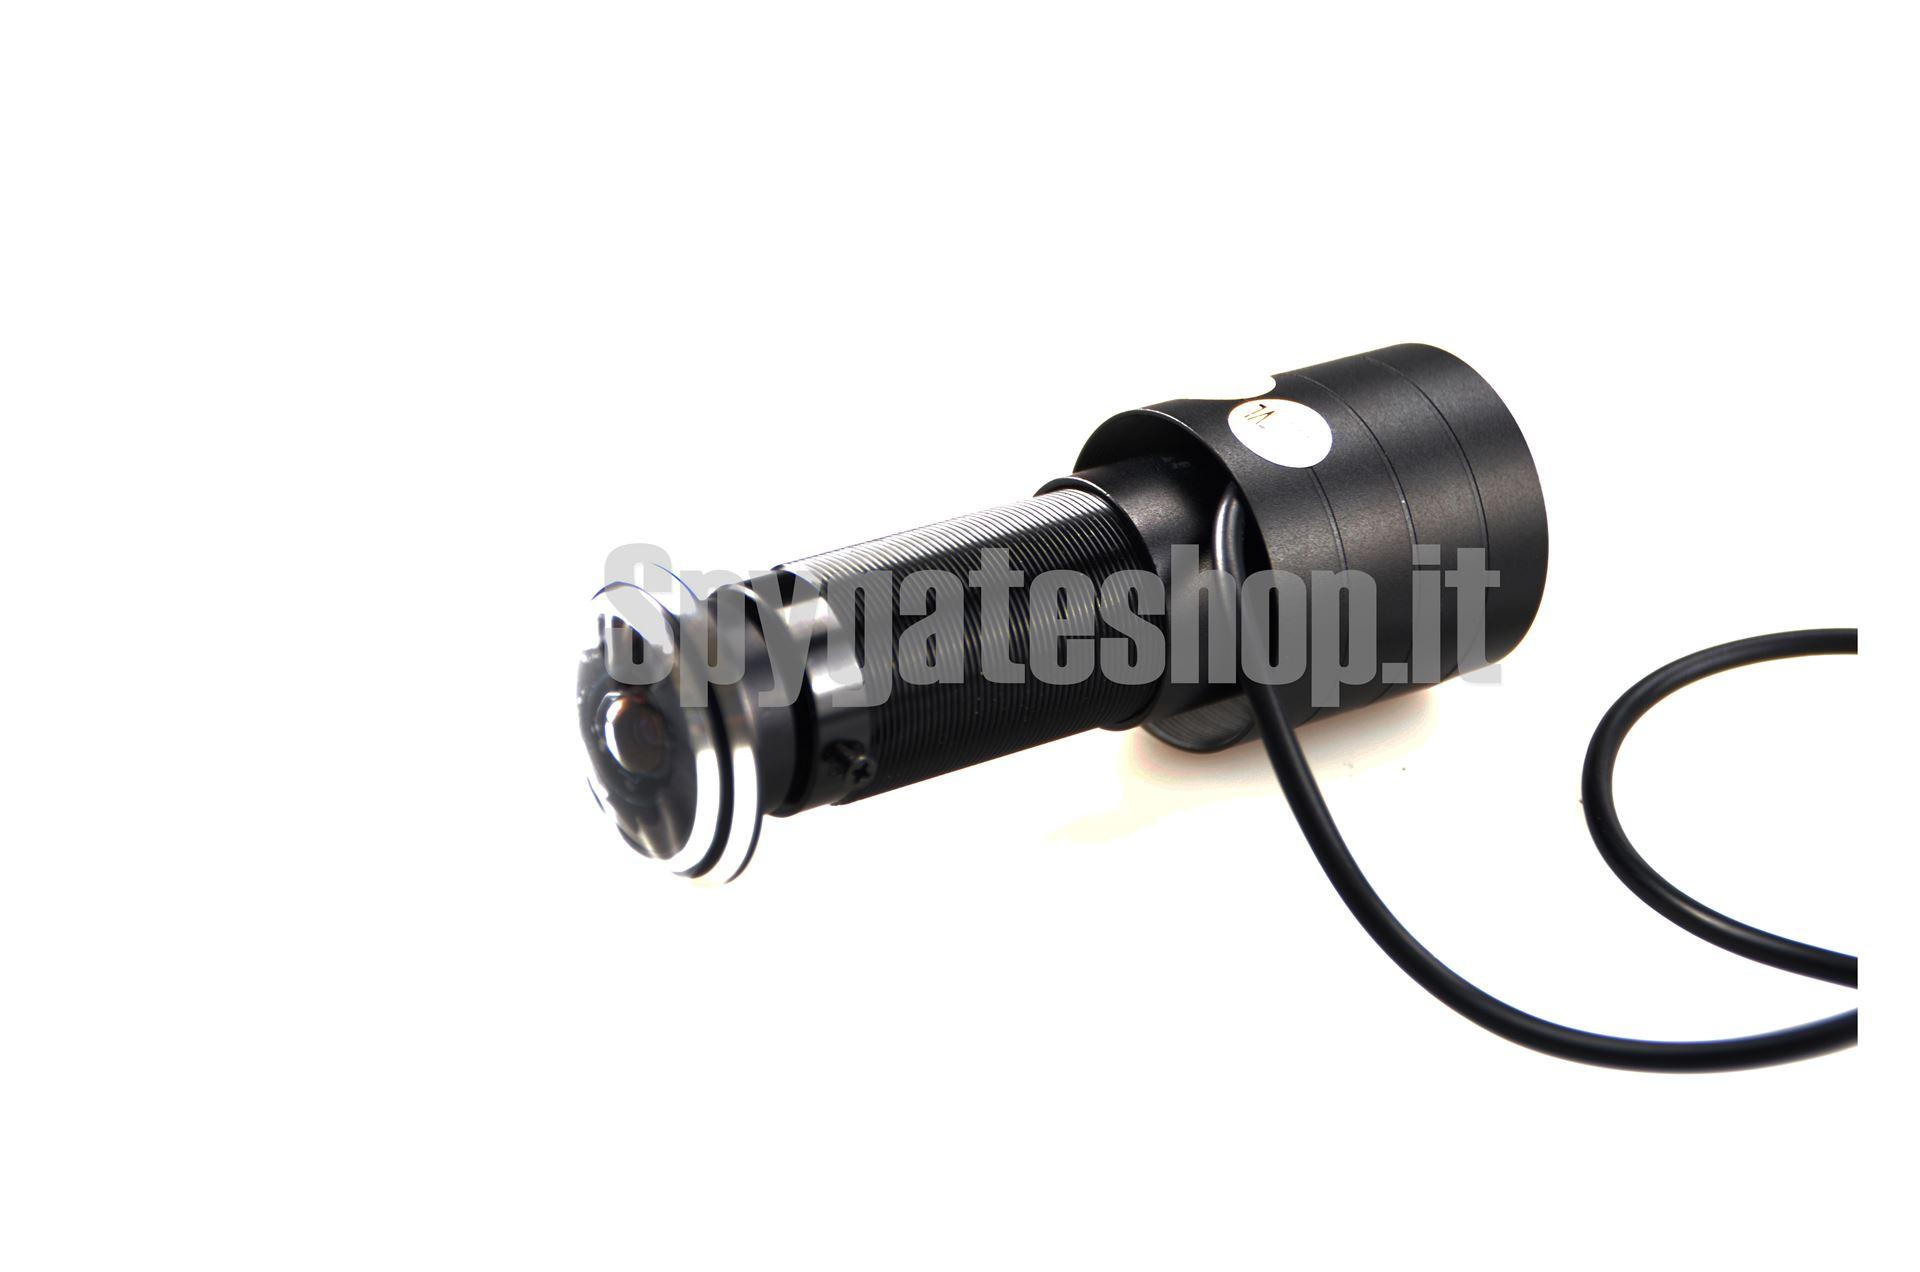 Spygate spy shop brescia telecamera in spioncino porta - Spioncino porta con telecamera ...